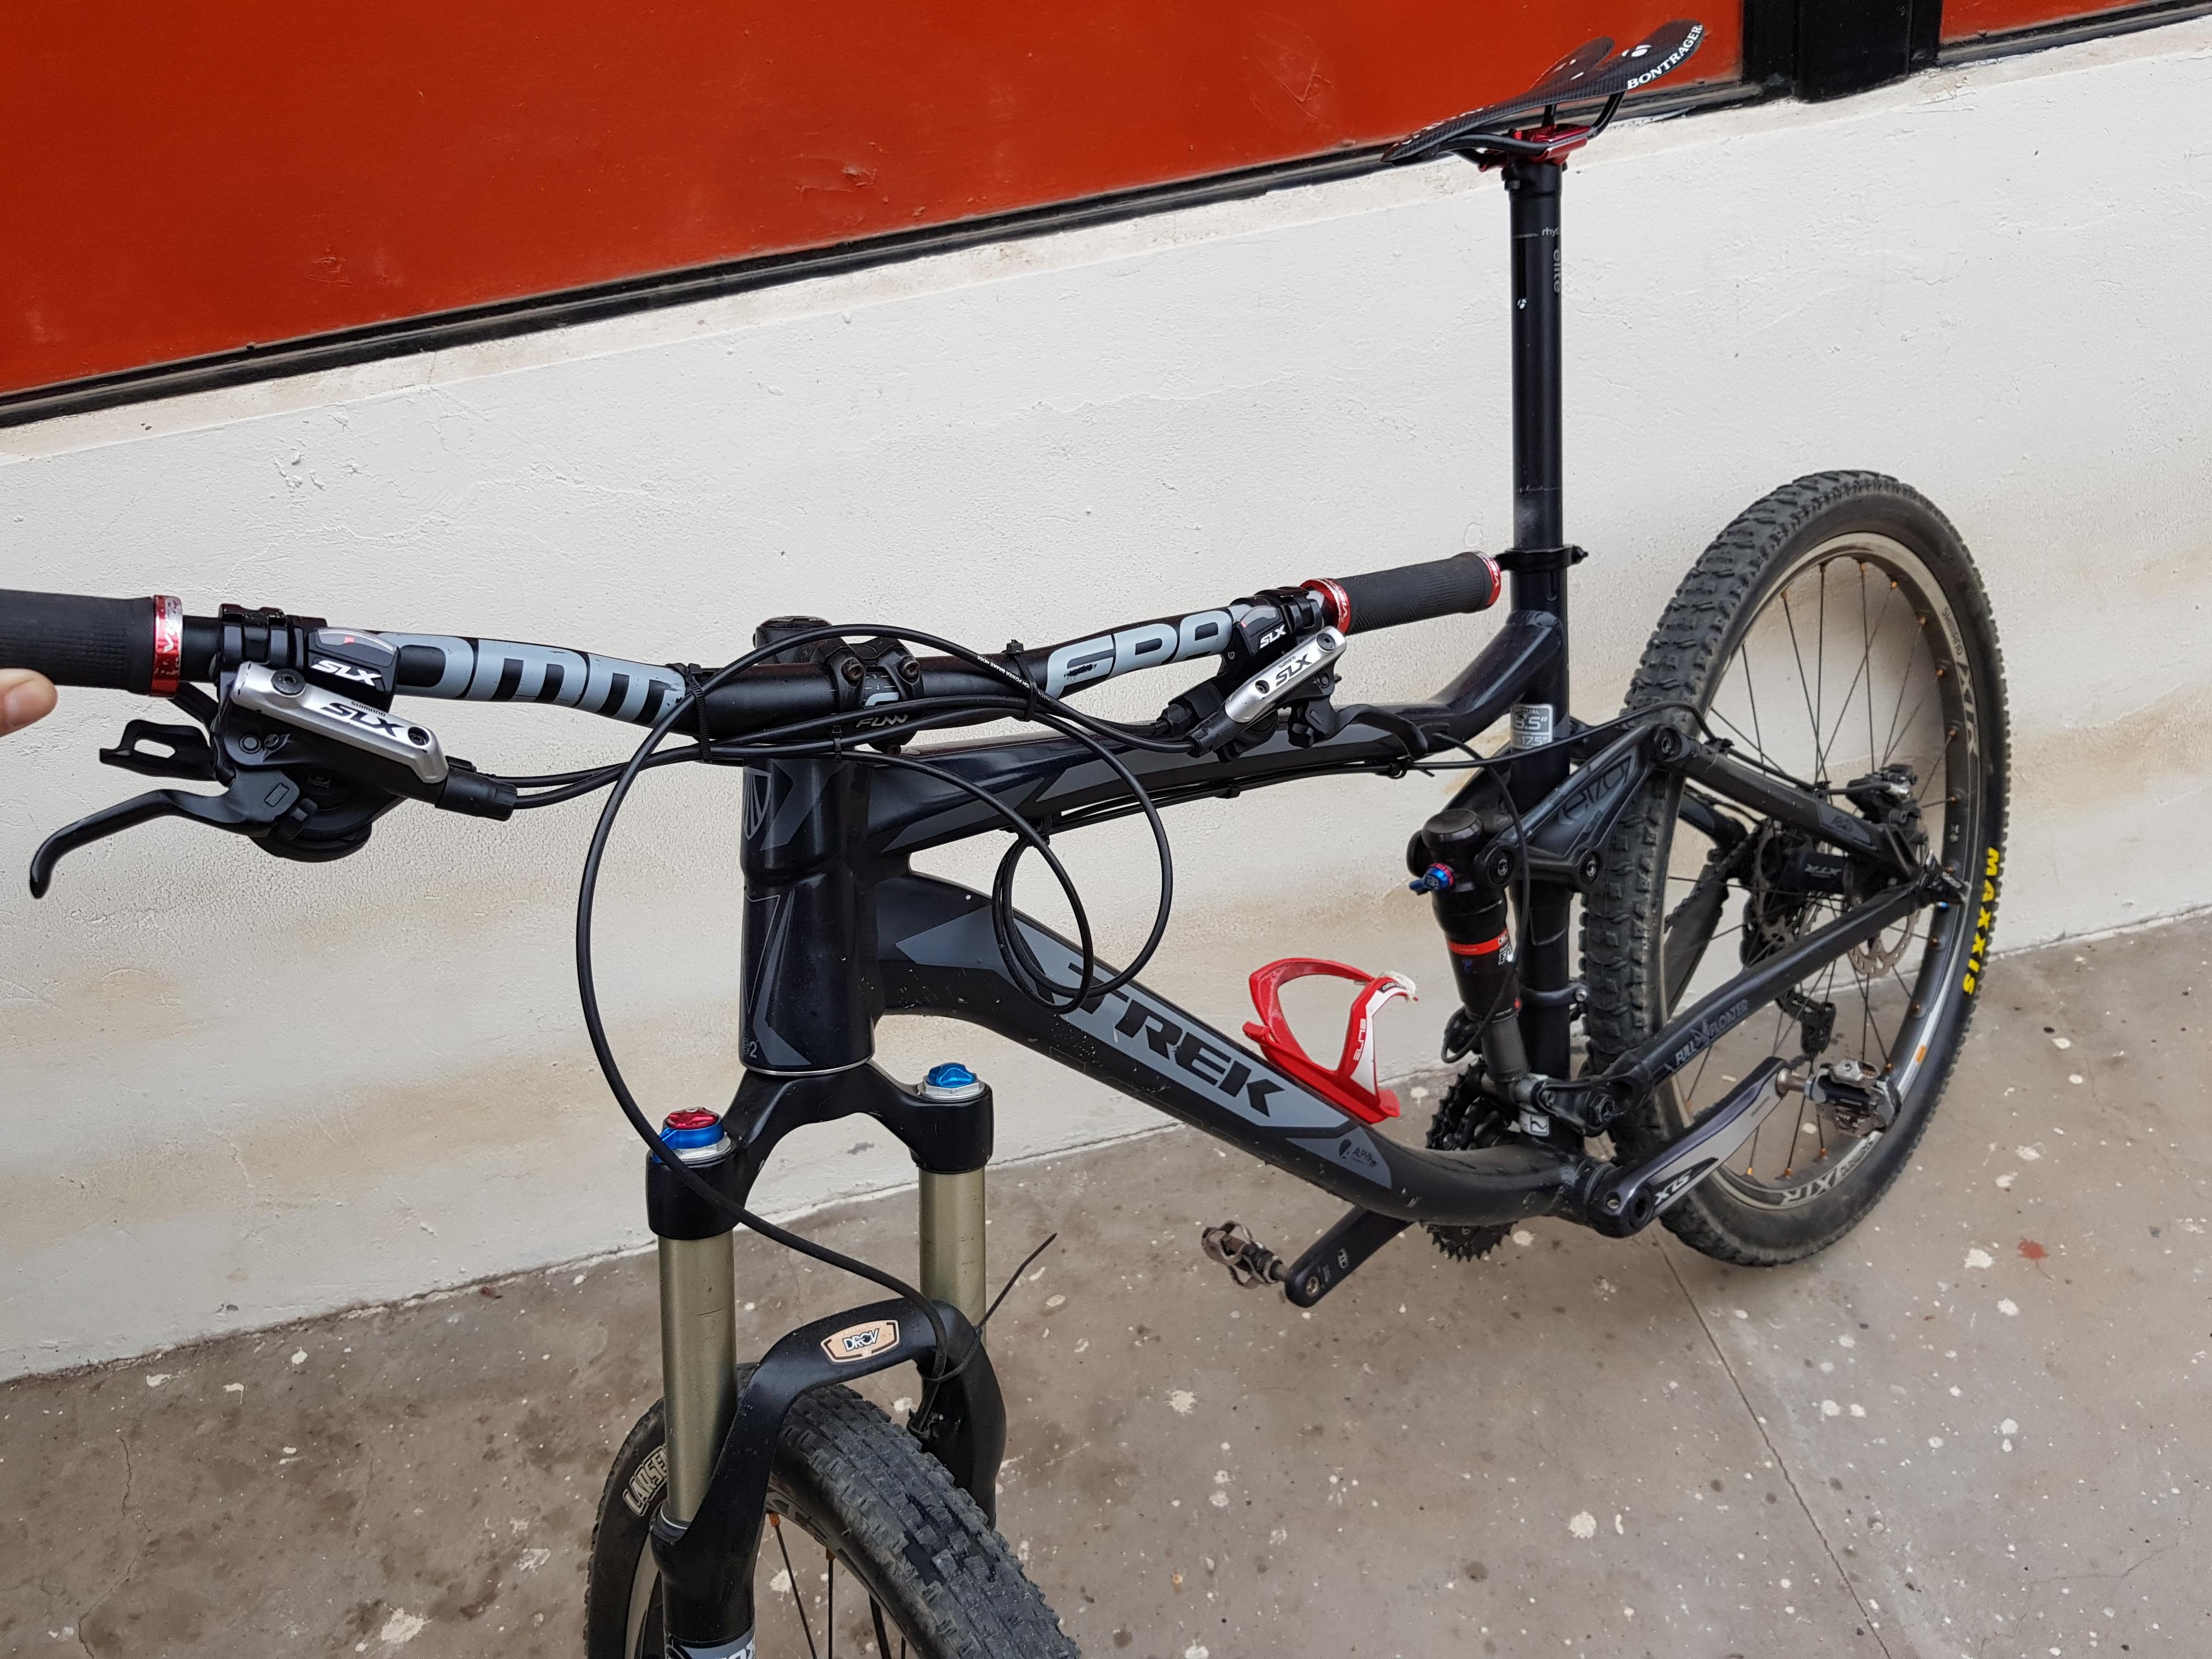 9273729f0fd Bicicleta All Mountain/Trail Trek Fuel EX 8 Año 2015 26 - BikeMarket